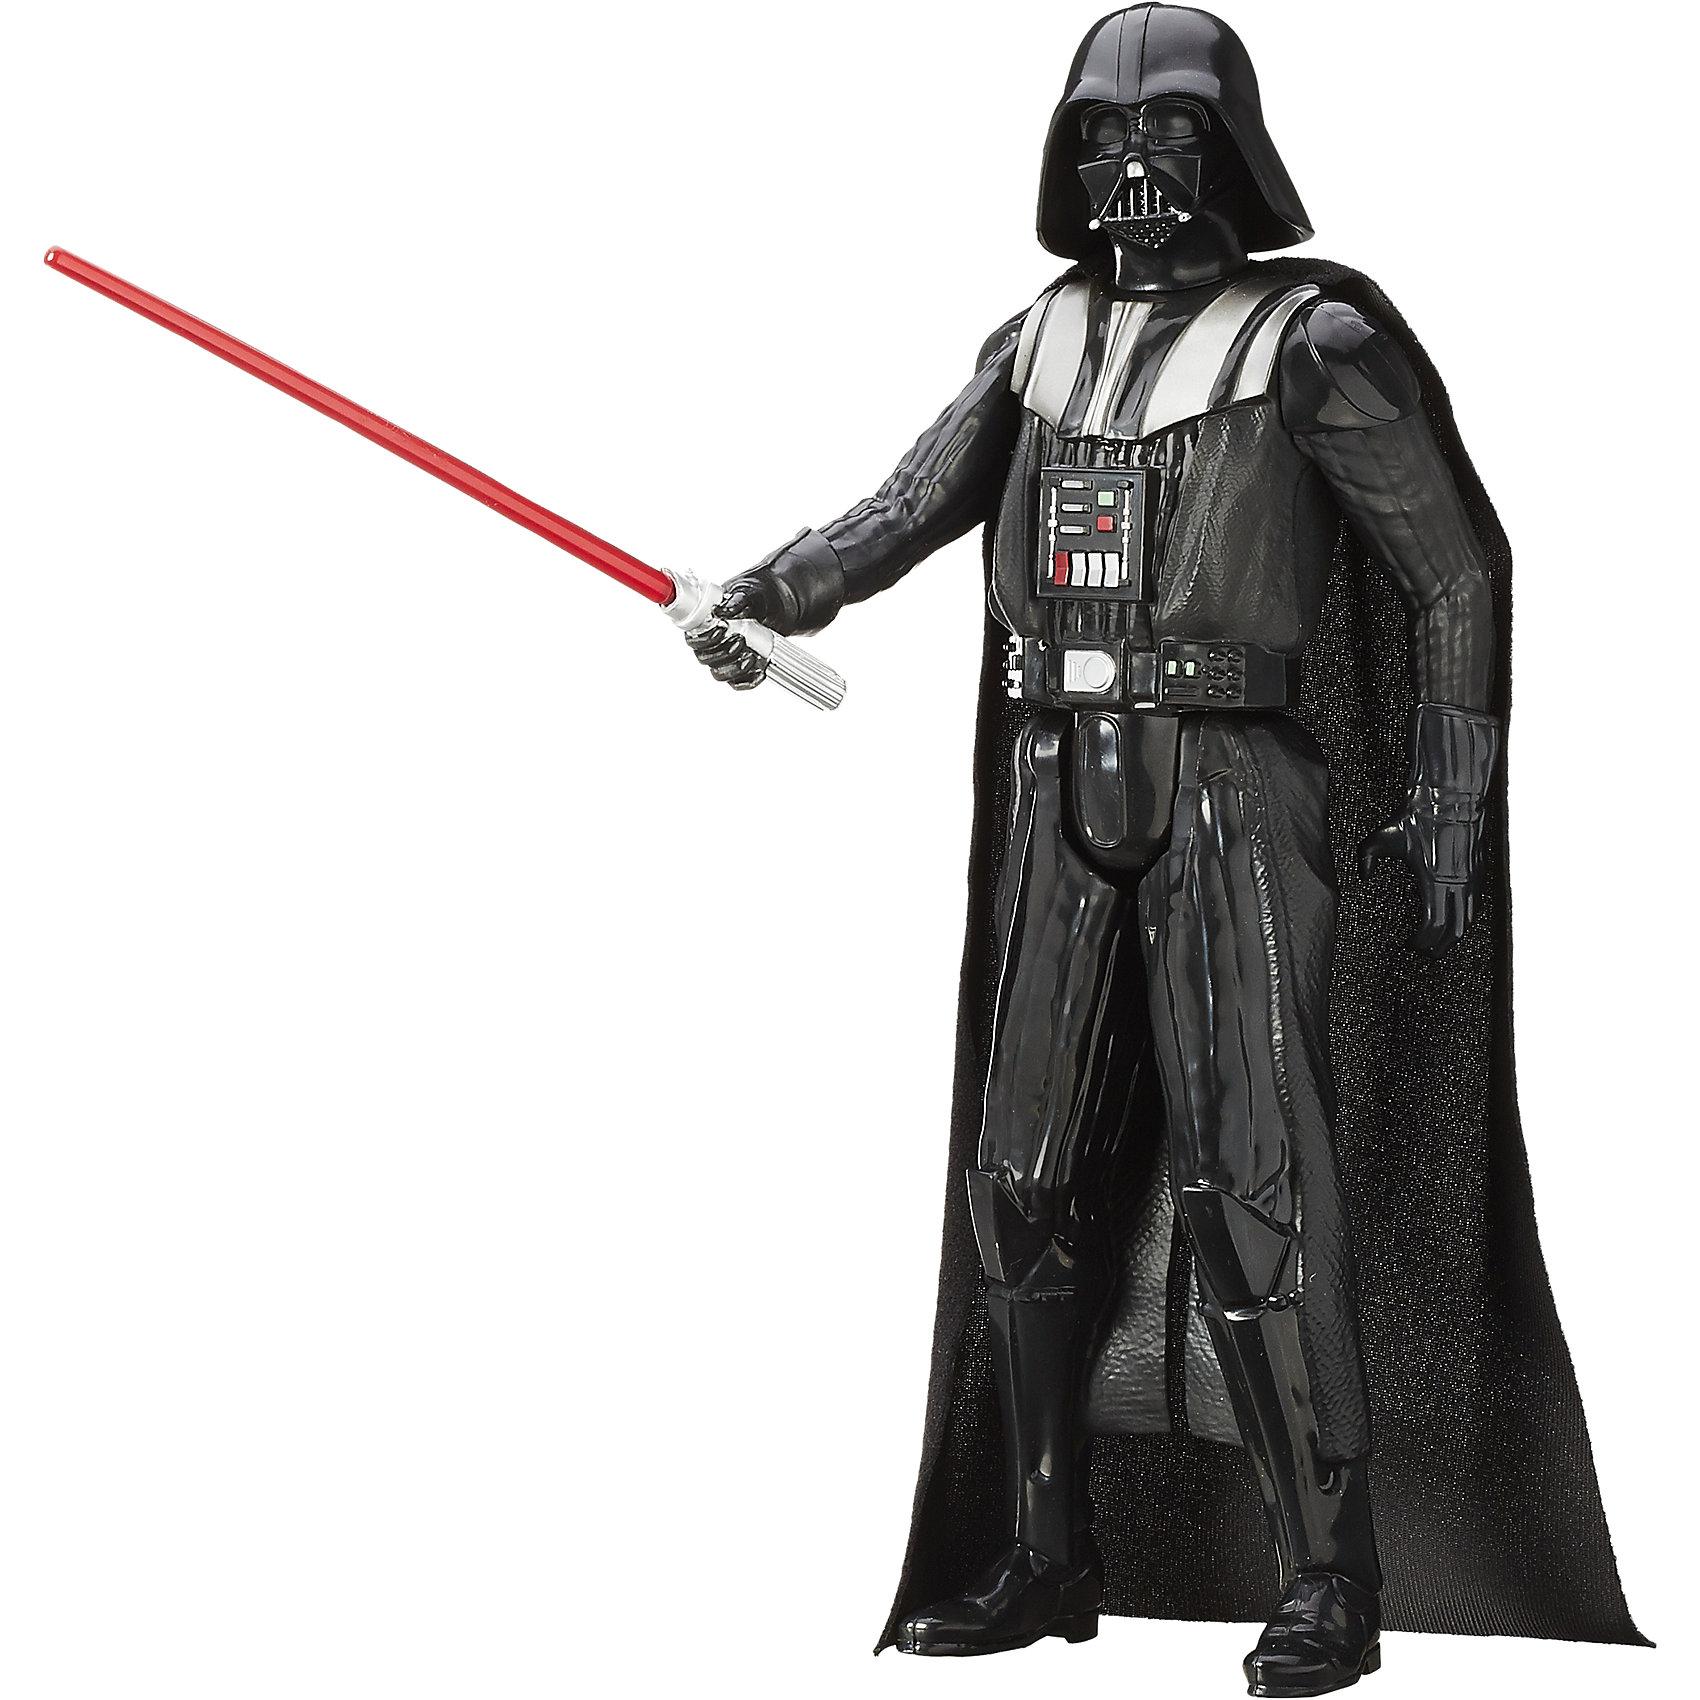 Hasbro Титаны: Дарт Вейдер,  Звездные войны hasbro hasbro световой меч звездные войны эпизод 8 дарт вейдер